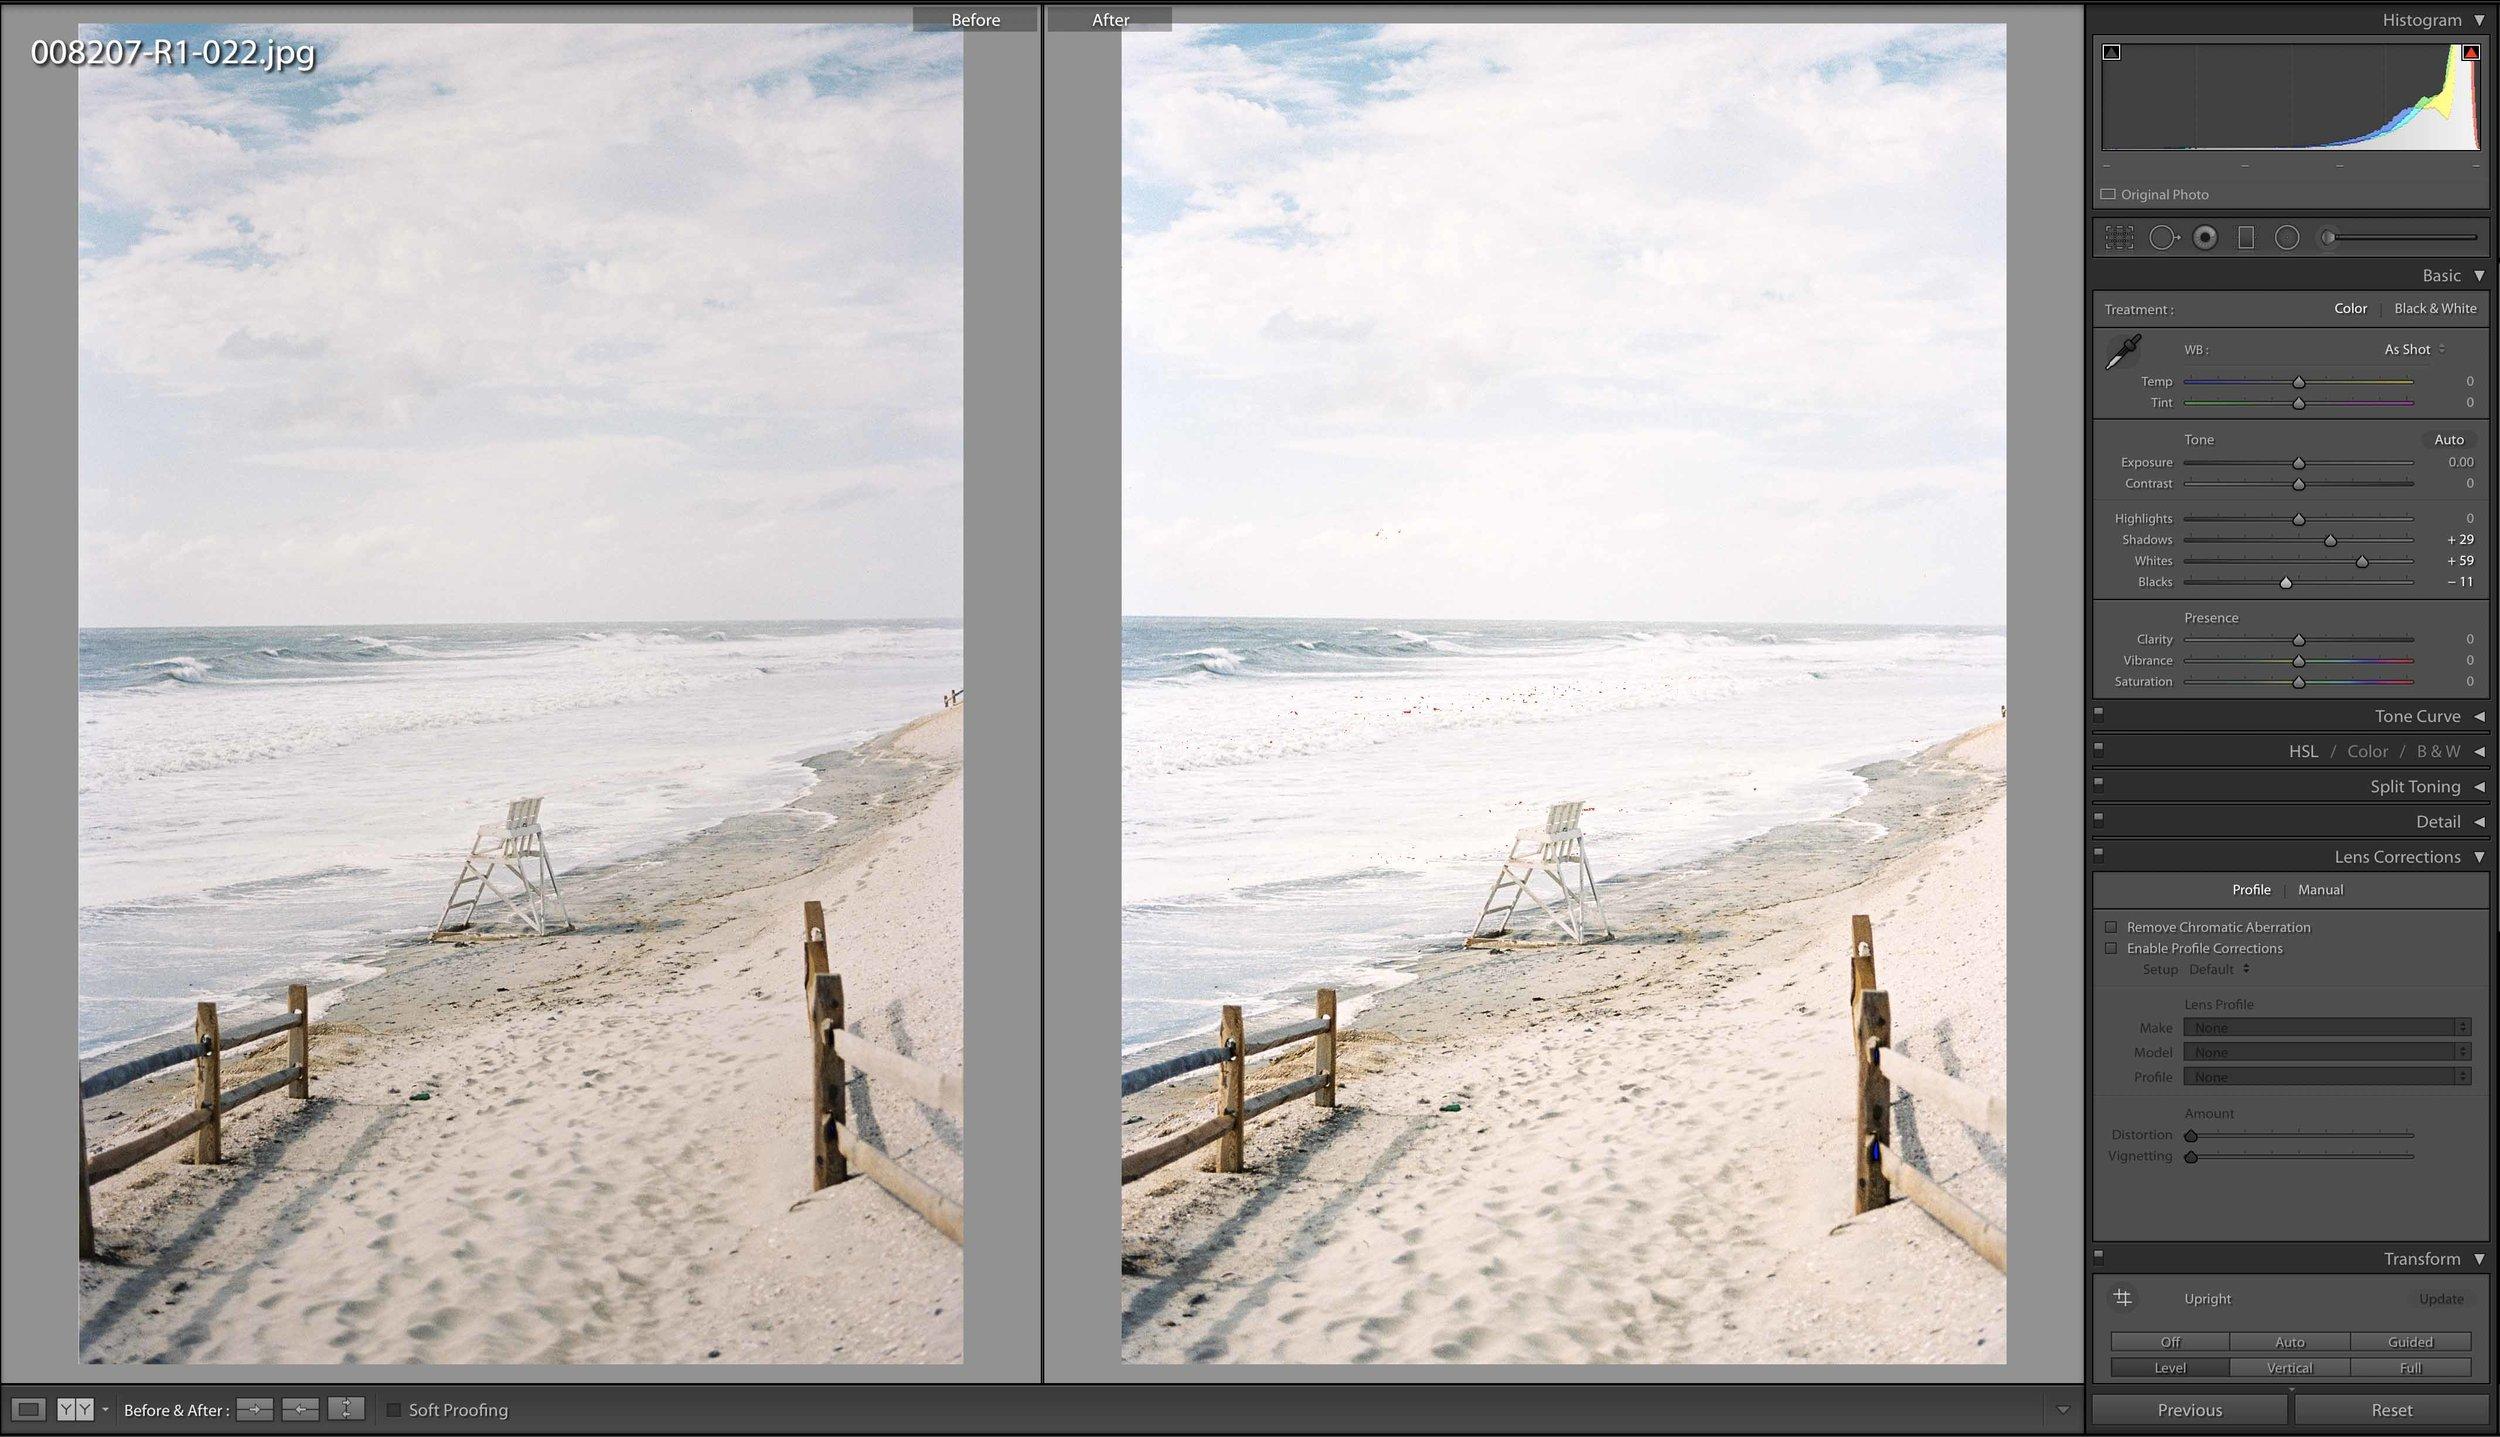 Leica M6, Summicron-M 50mm f/2, Kodak Portra 400,Rated @ 200 ISO